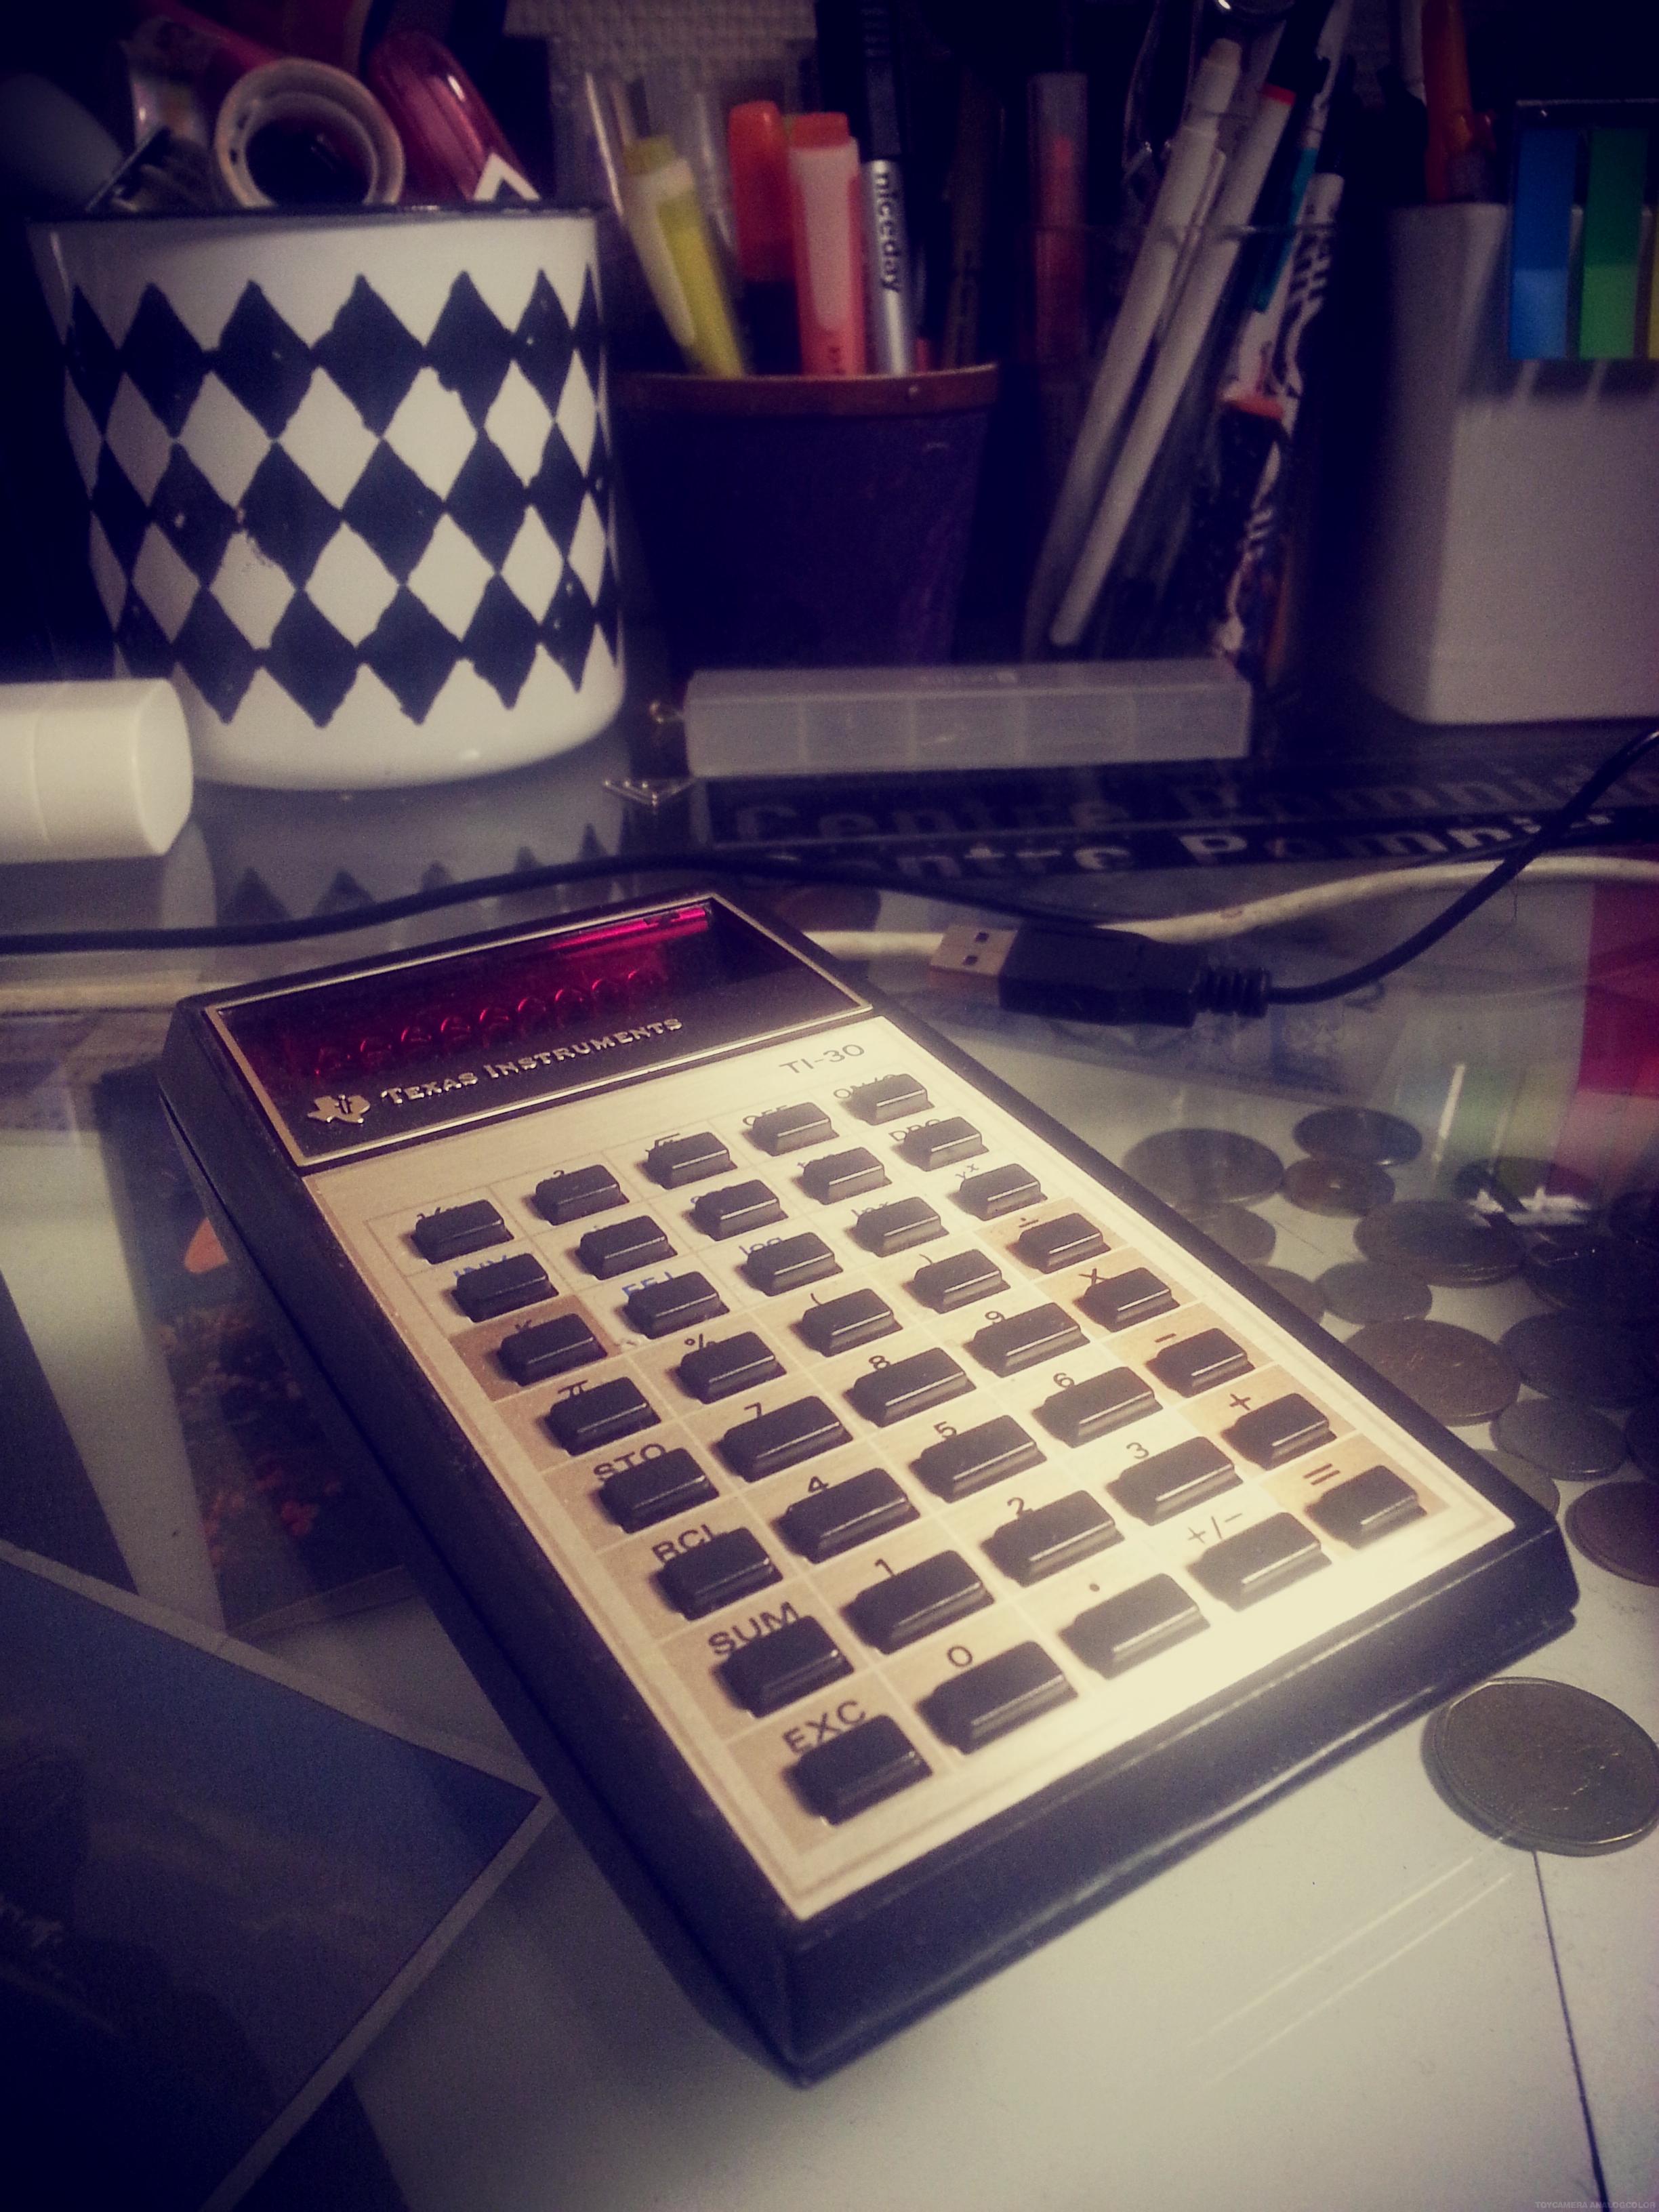 Calculatrice datant